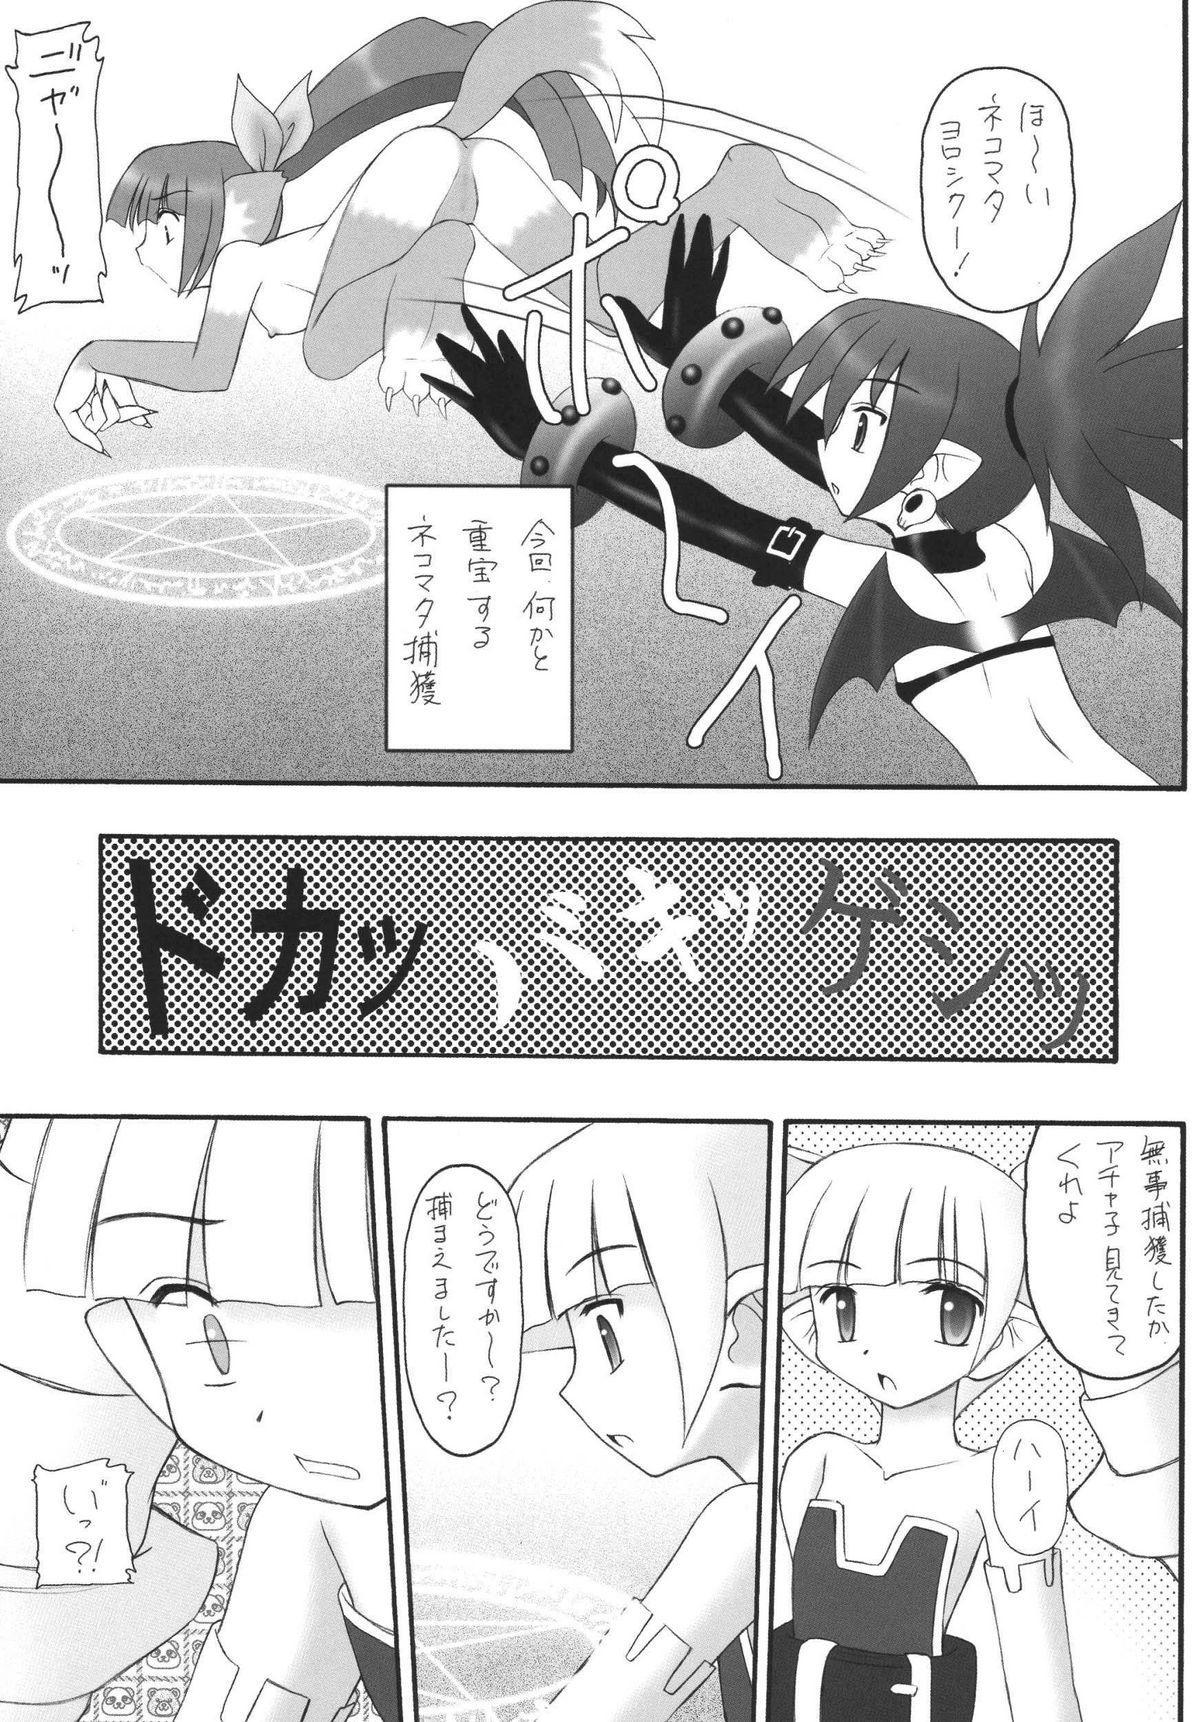 Kanimiso Vol. 4 - Love Dynamites 3